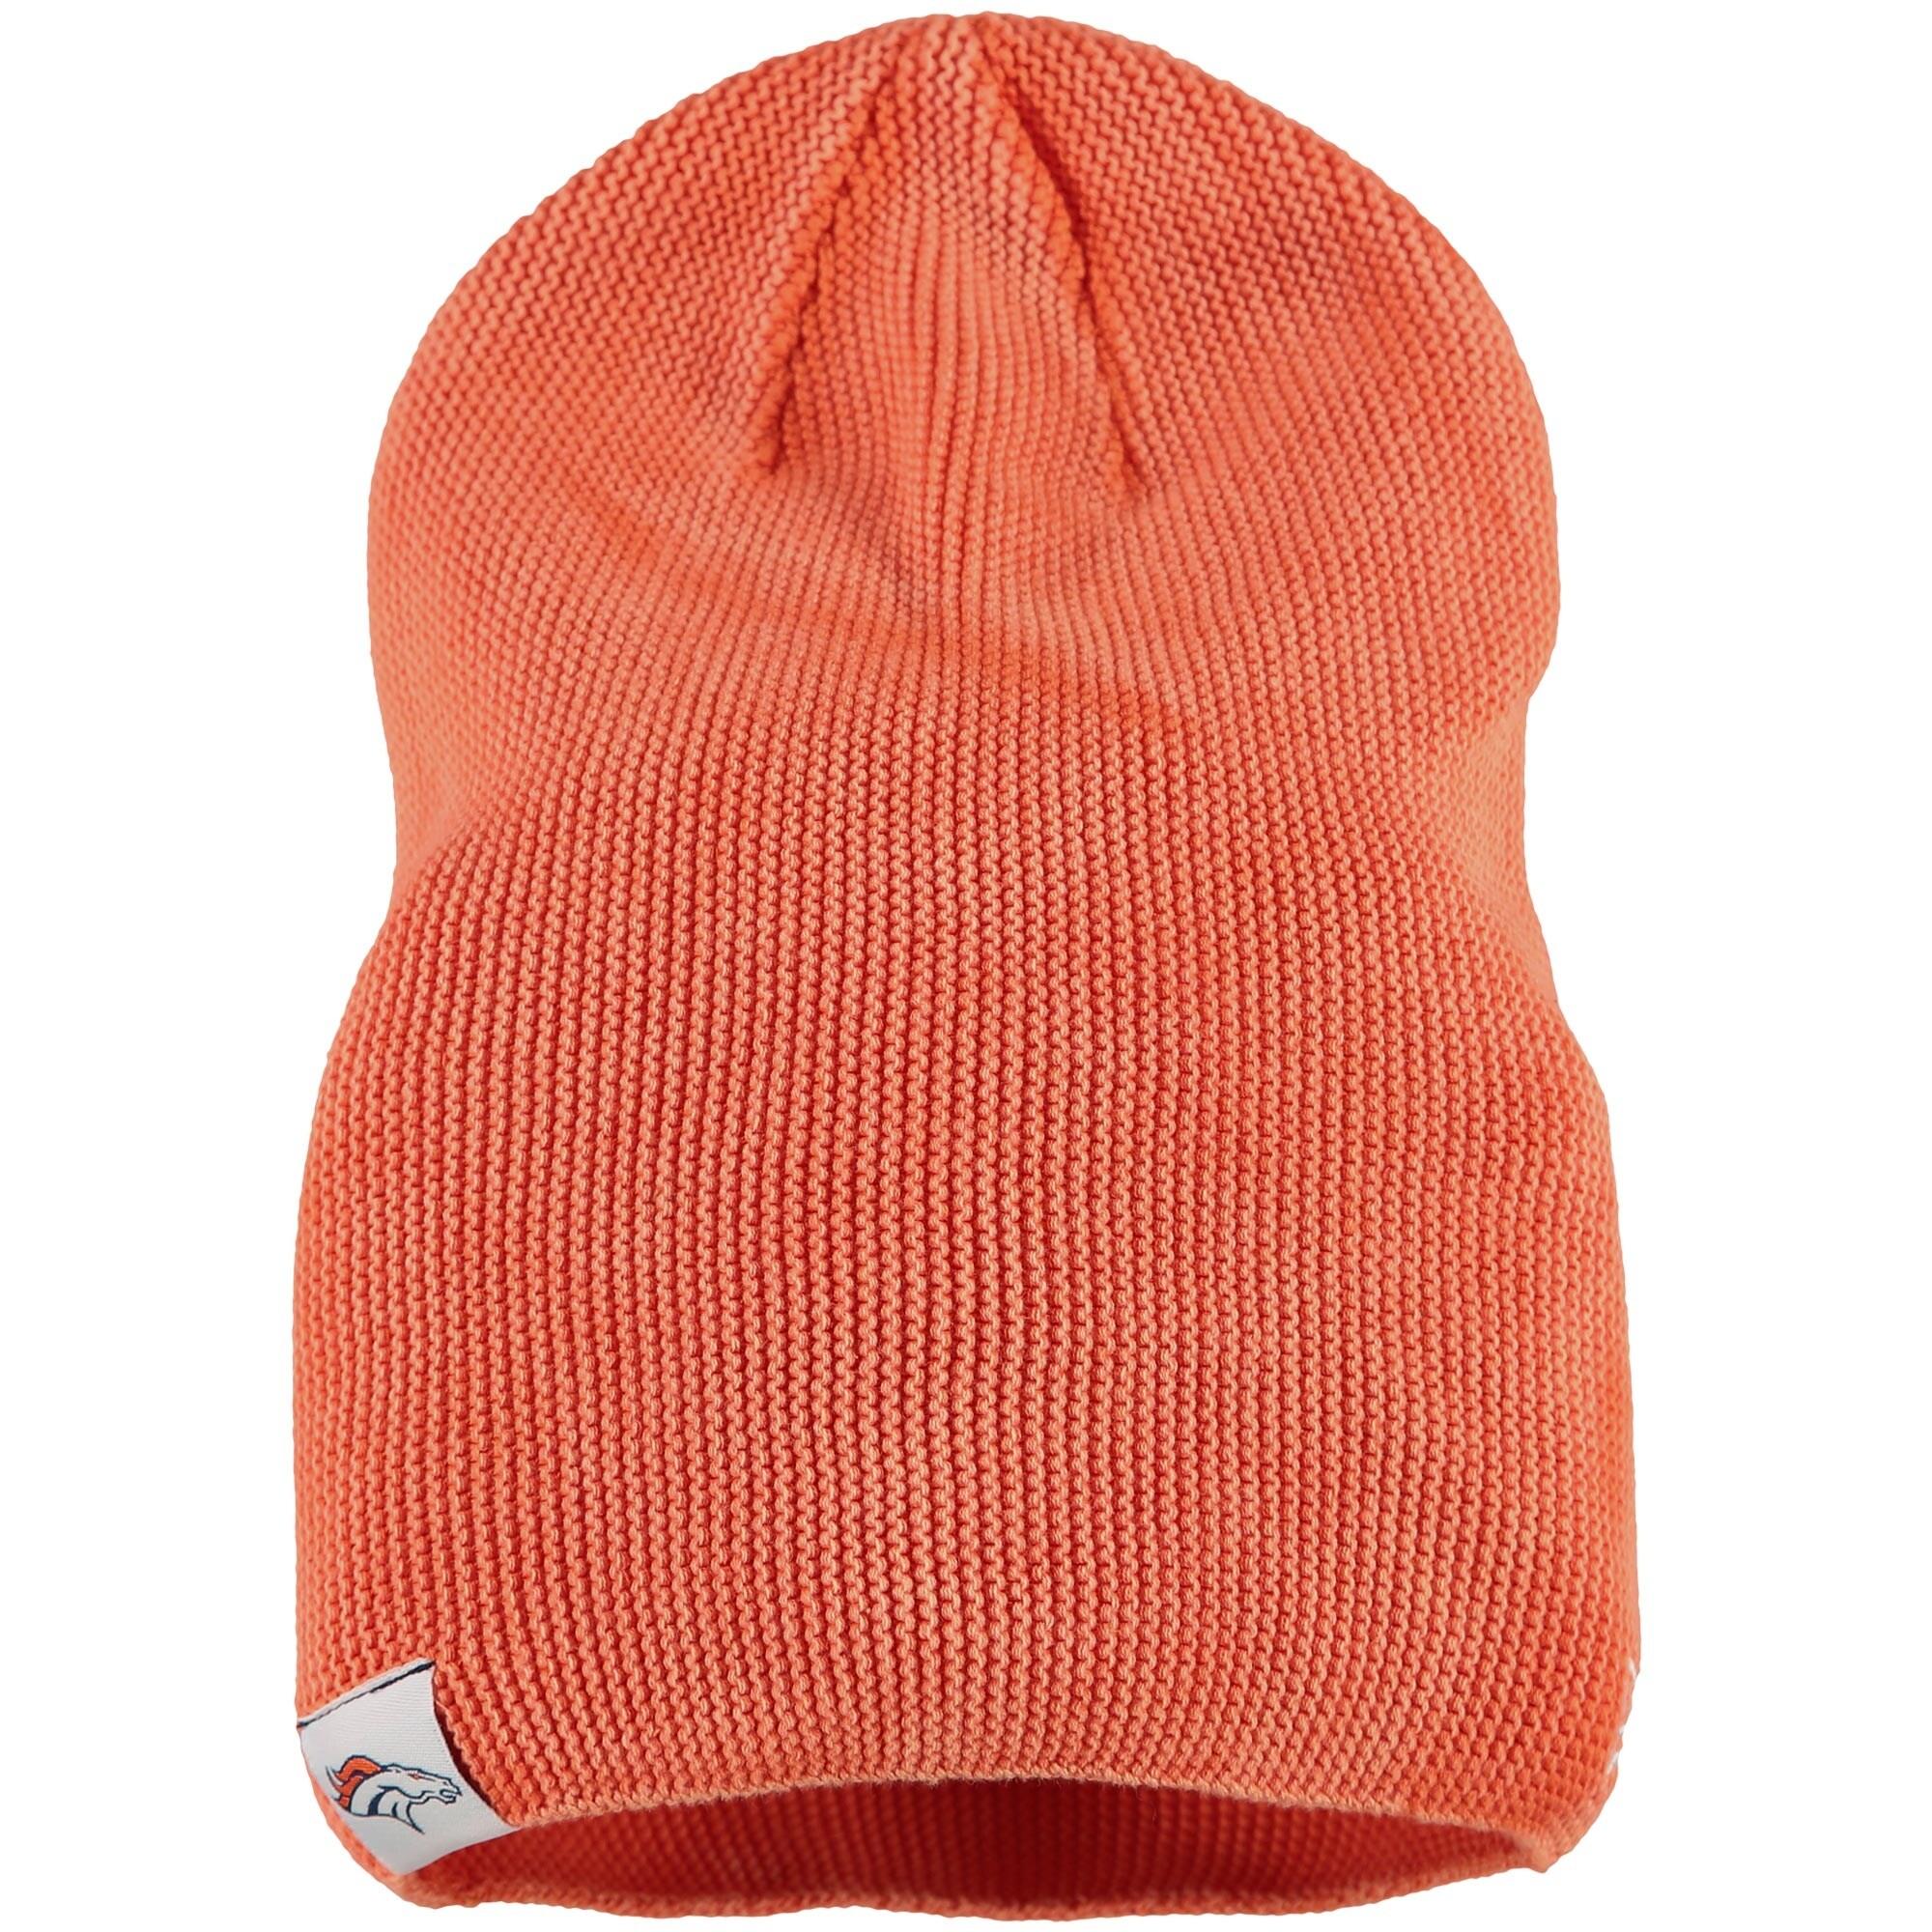 Denver Broncos New Era Women's Slouch Pick Knit Beanie - Orange